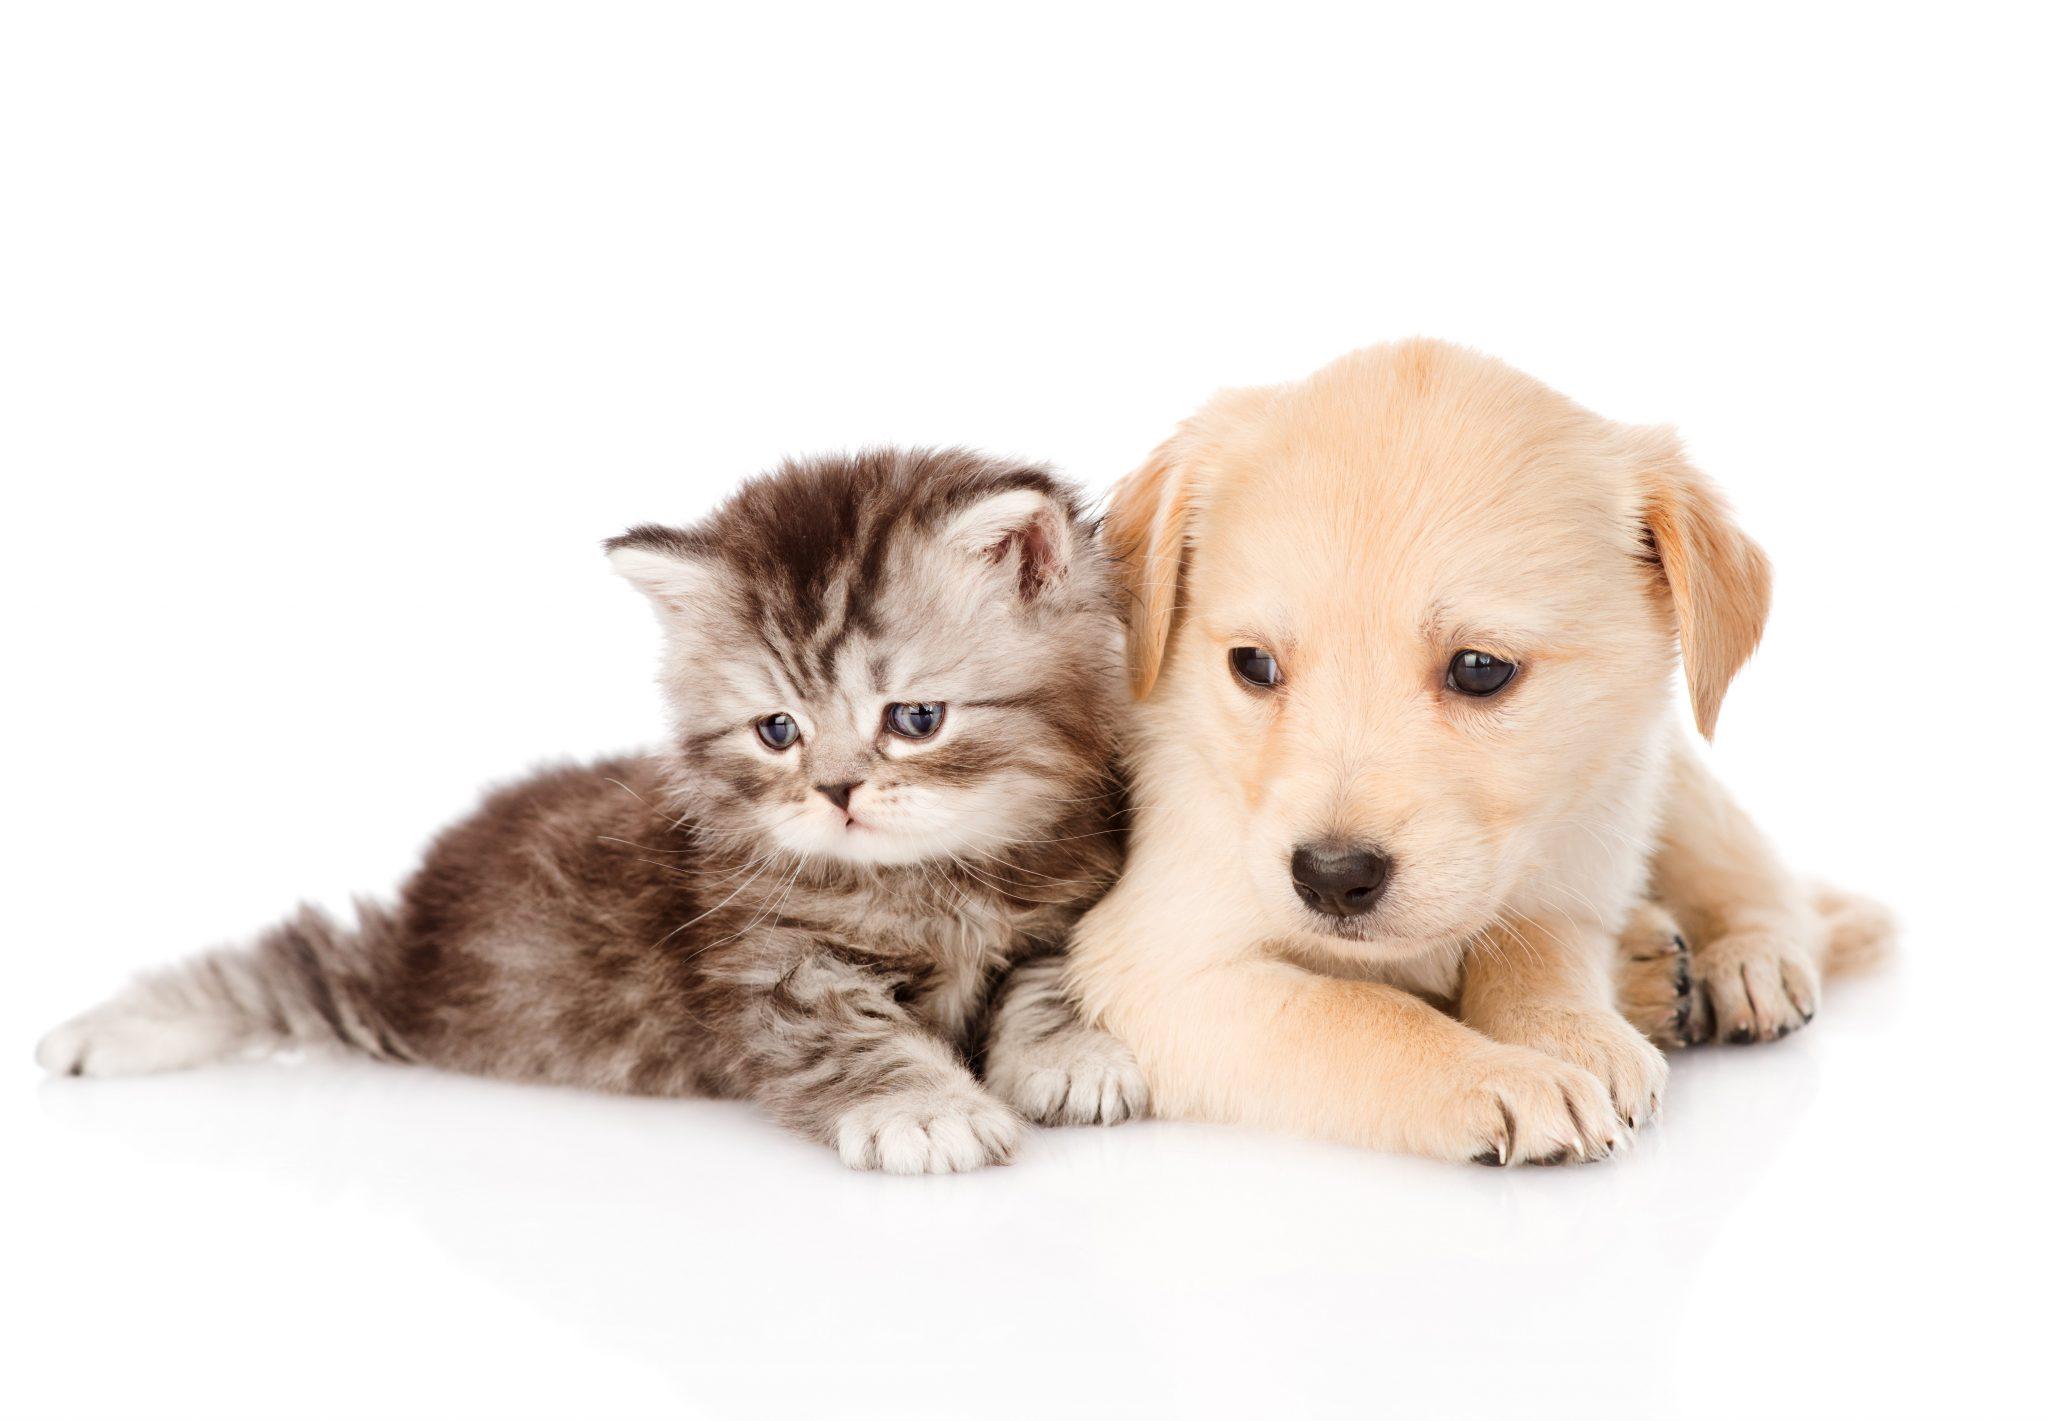 Cute Dog and Cat Wallpaper HD 2048x1421